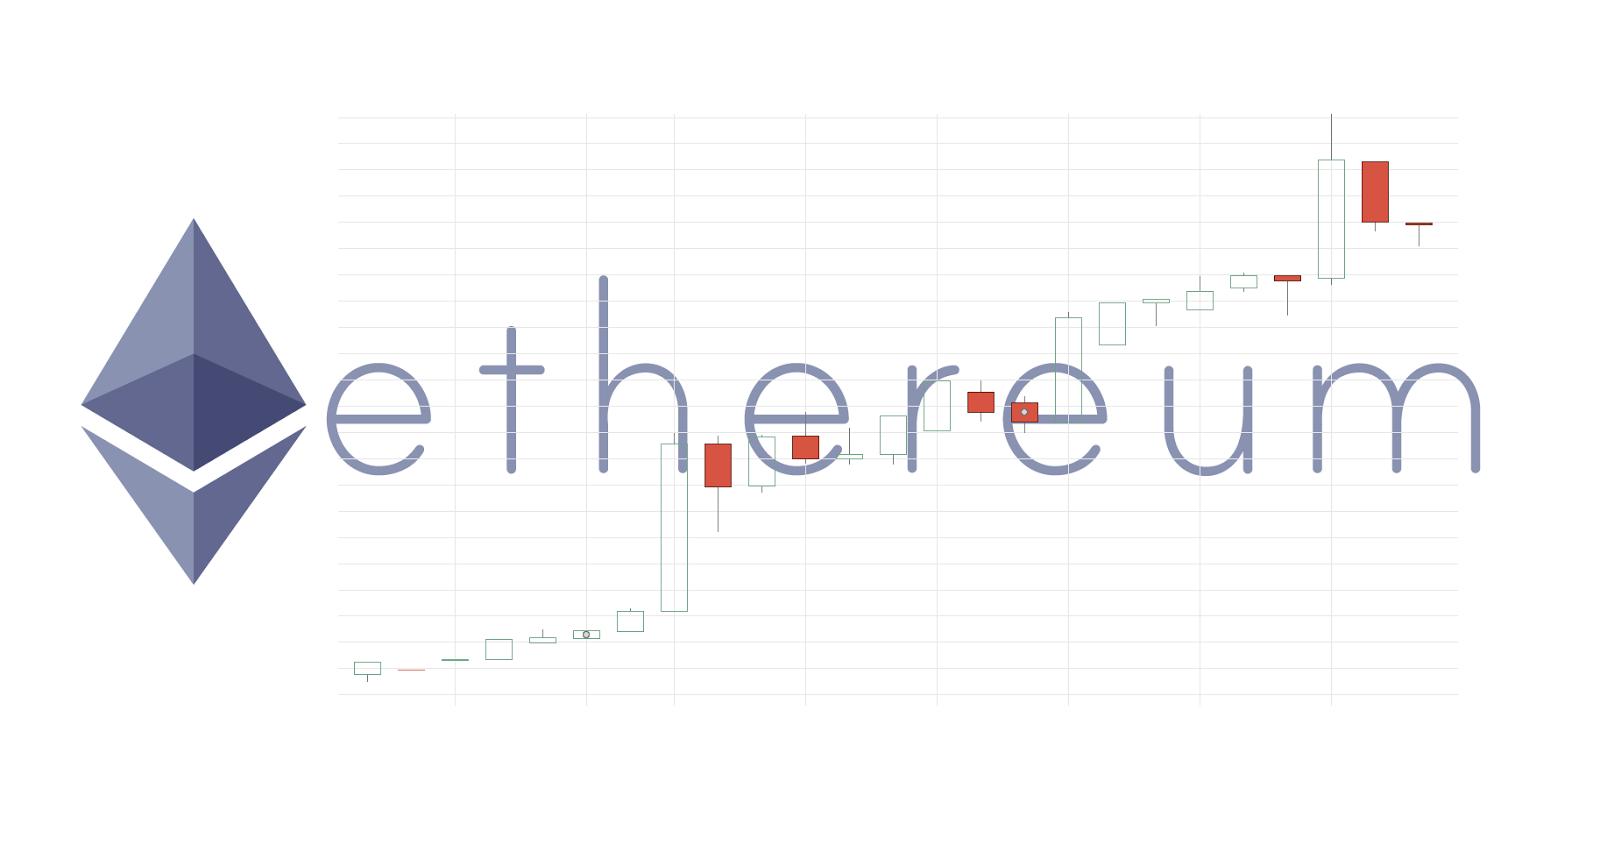 Ethereum Price Hits 2017 Highs At 13 40 After Jp Morgan Bny Mellon